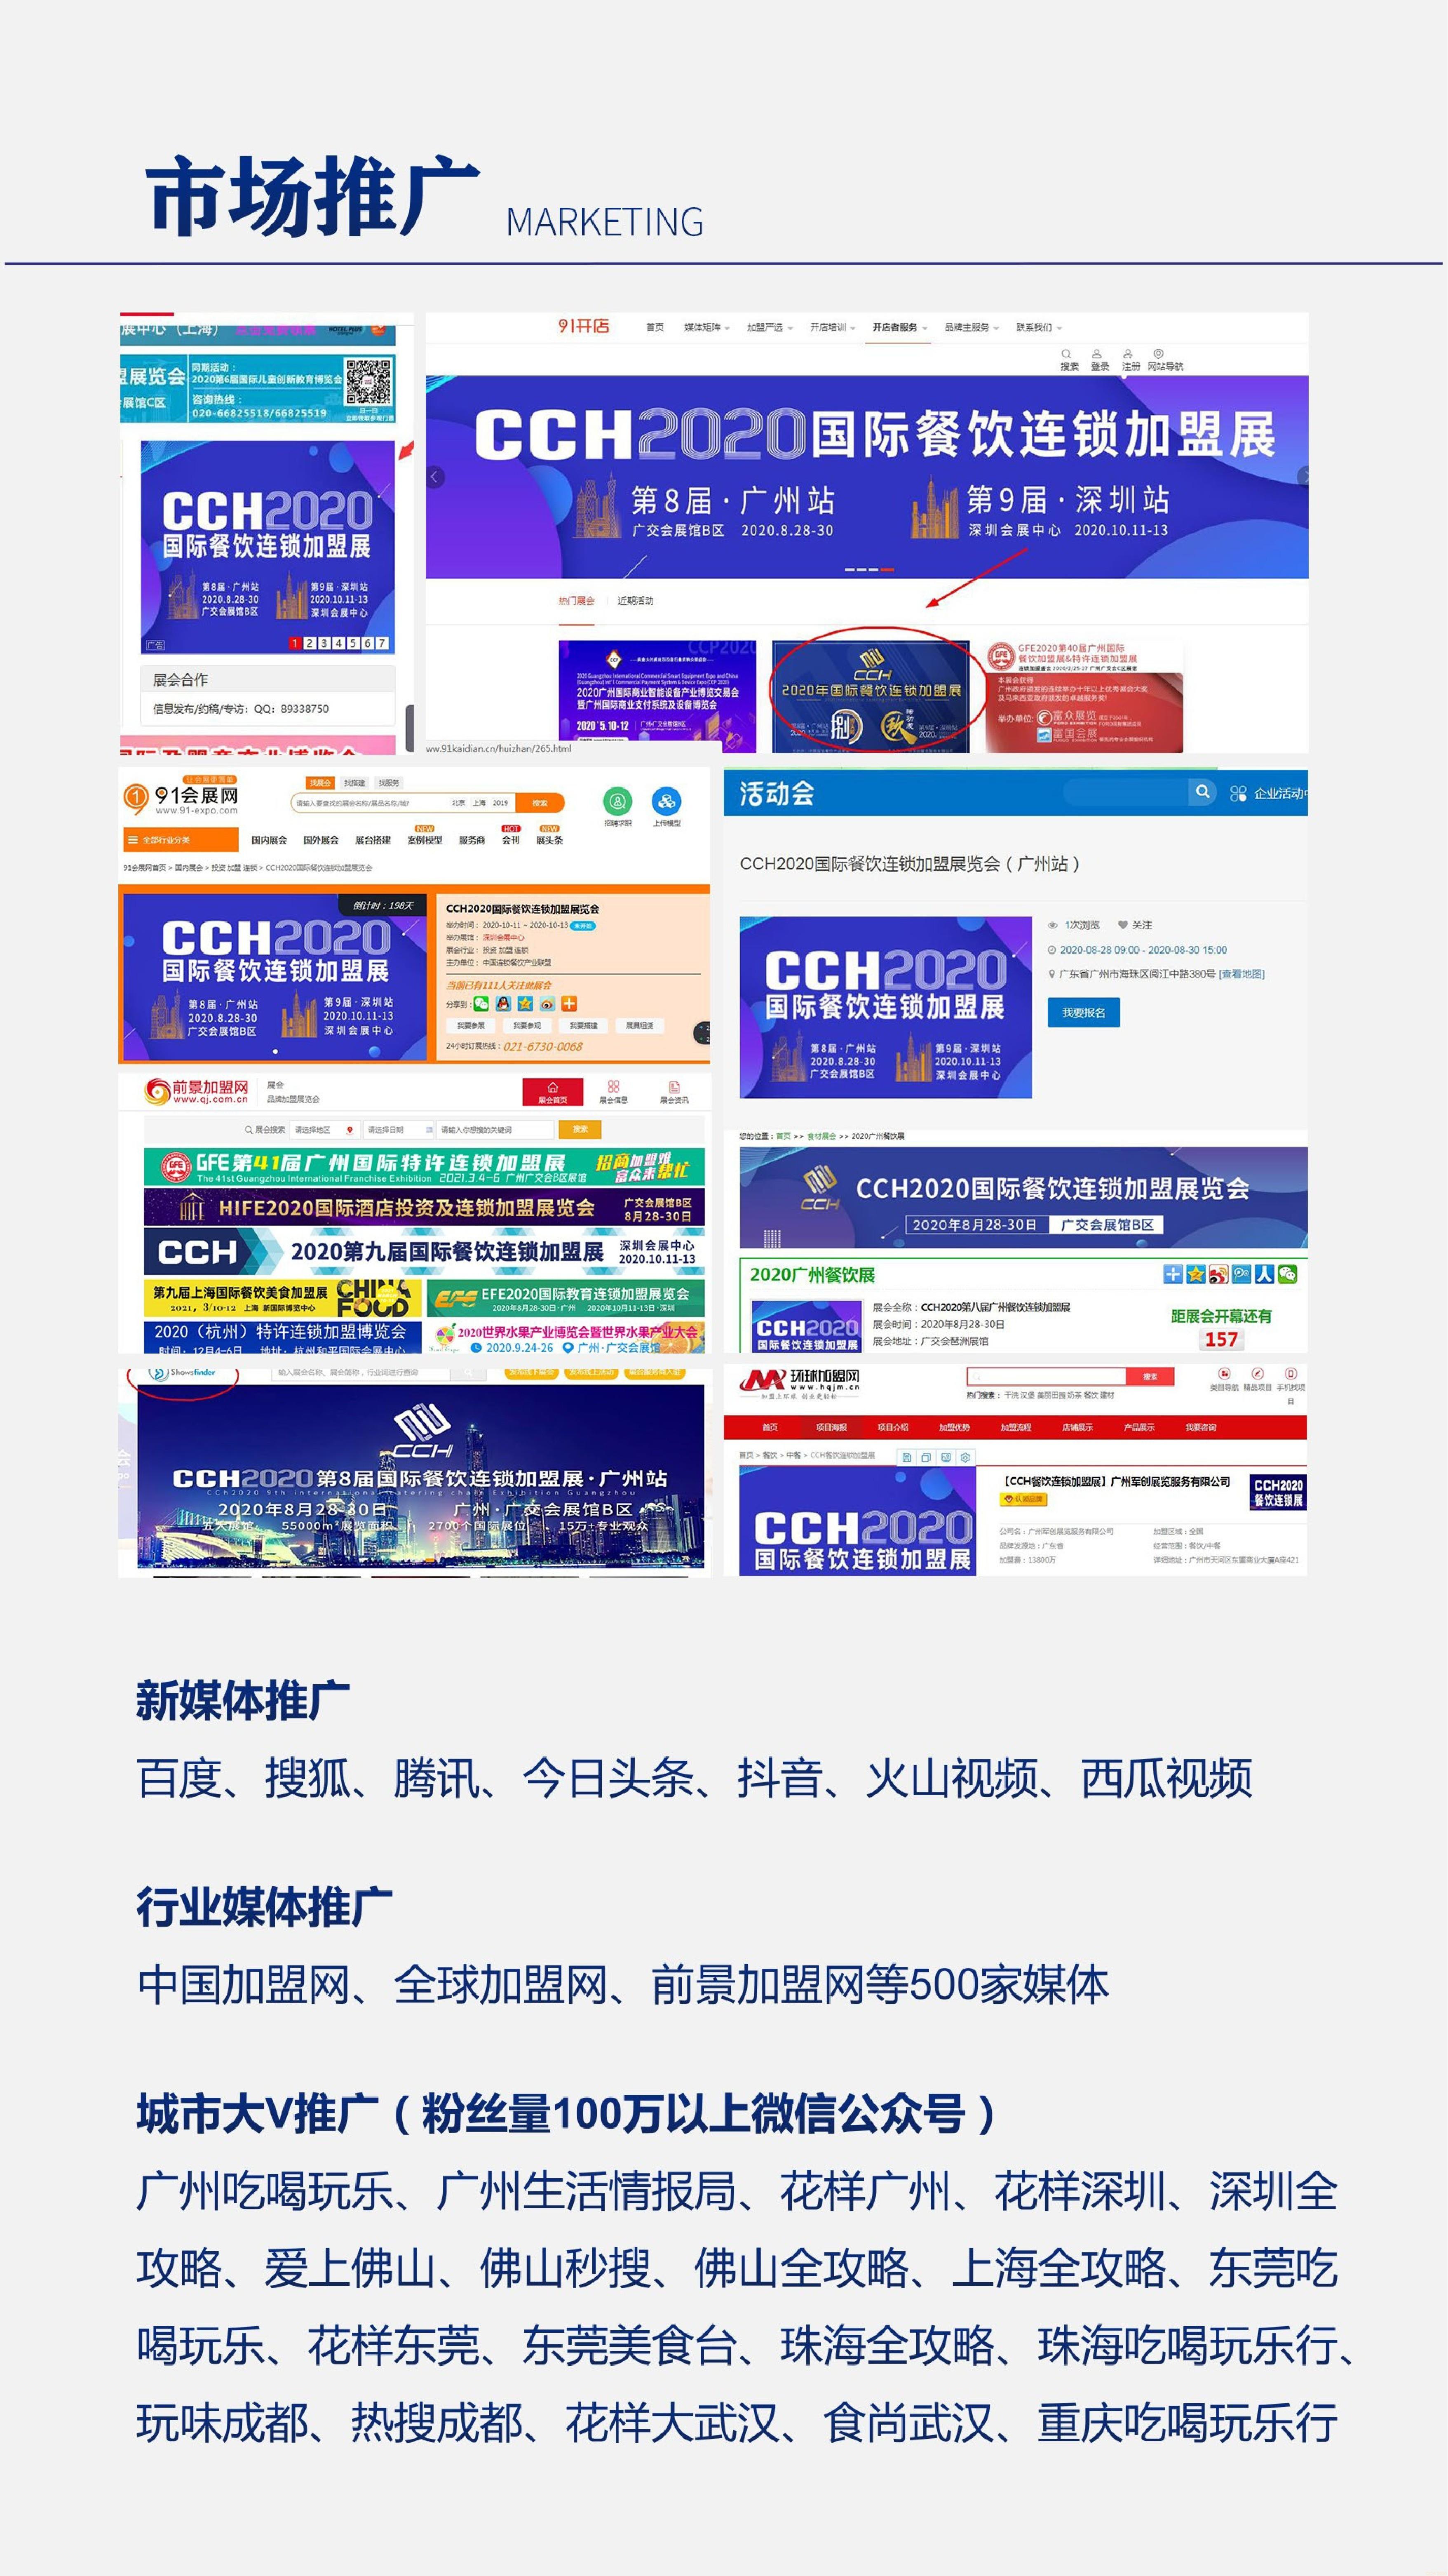 CCH2021-餐饮邀请函·赵(2)(1)-017.jpg